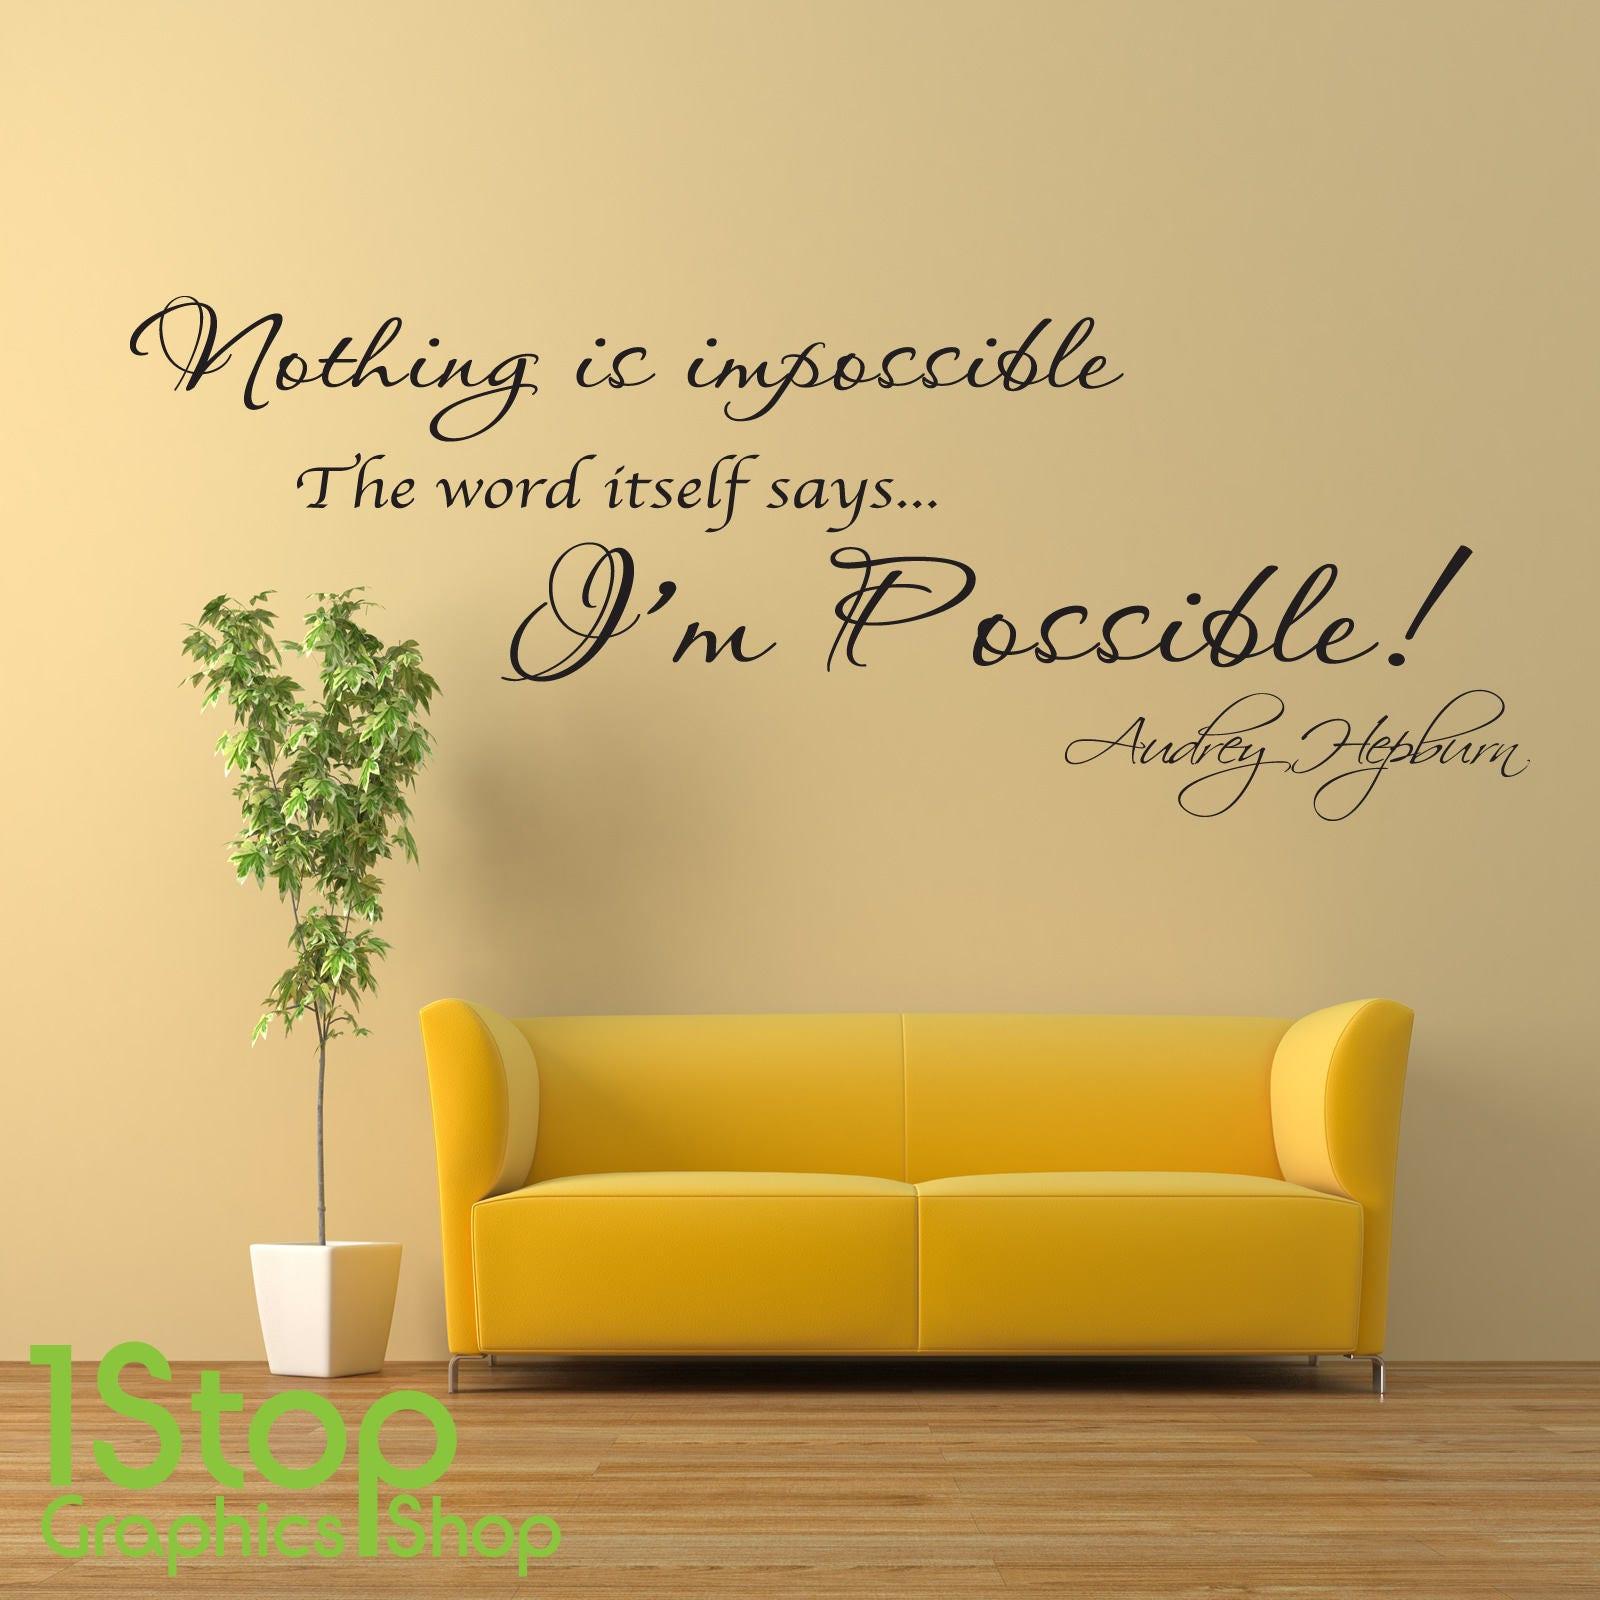 Audrey Hepburn Wall Sticker Quote Home Bedroom Wall Art Decal X74